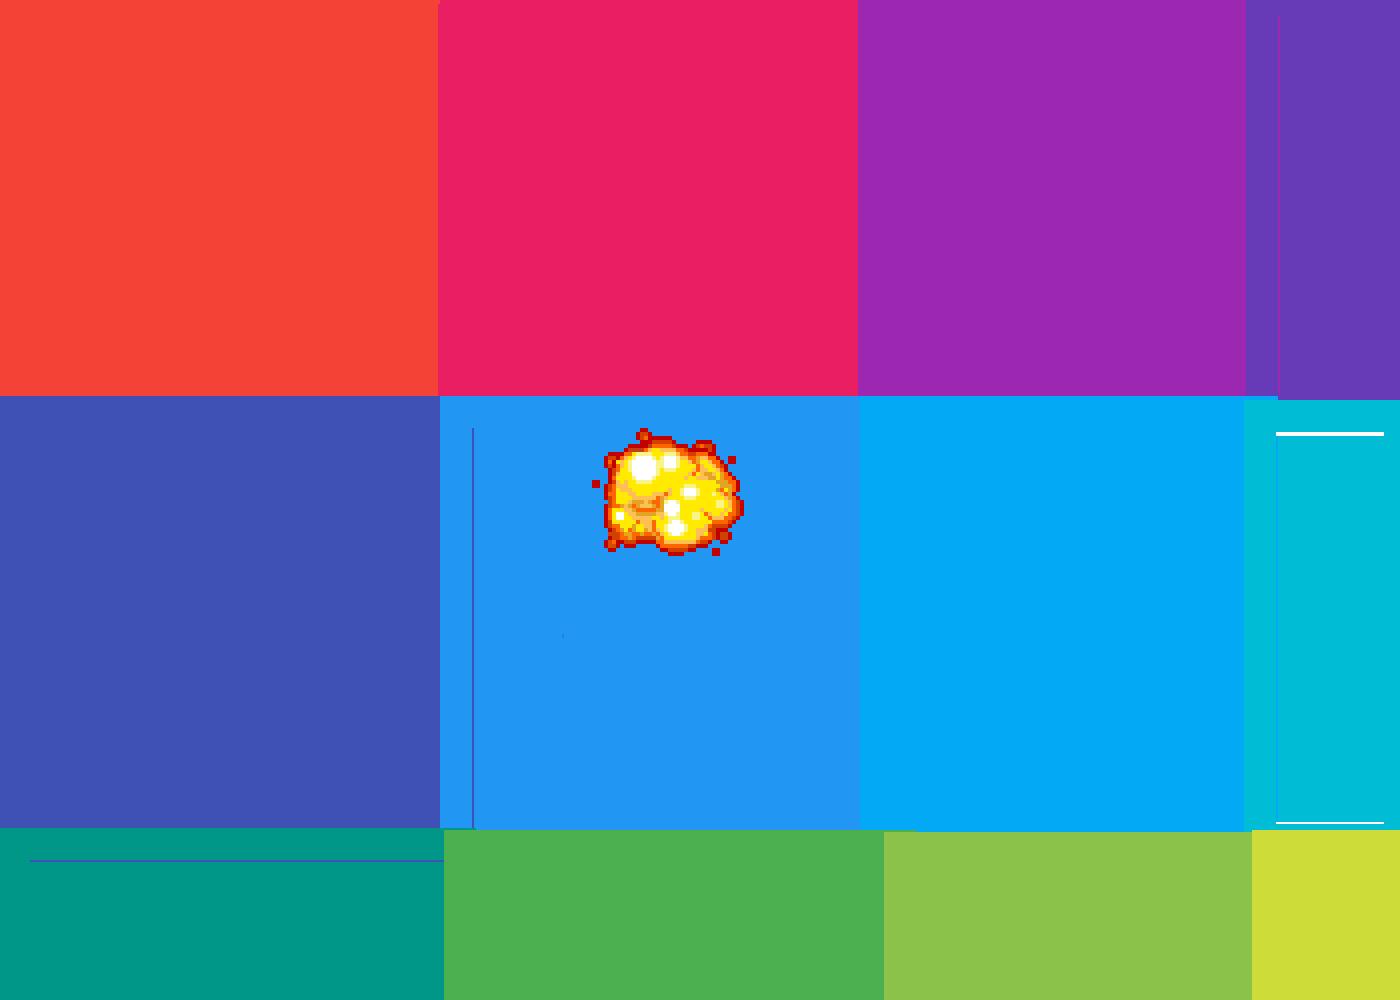 colors by avethewinner202